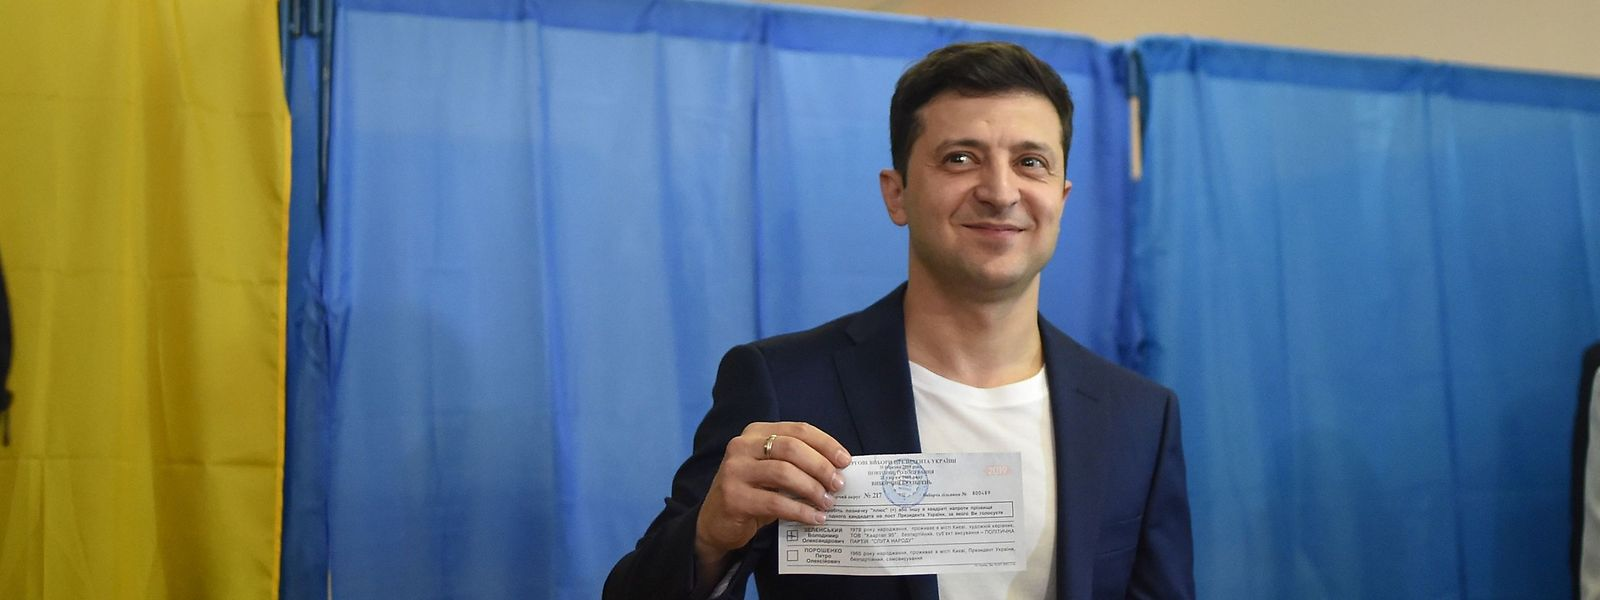 Polit-Neuling Wolodymyr Selenskyj hat gewählt.